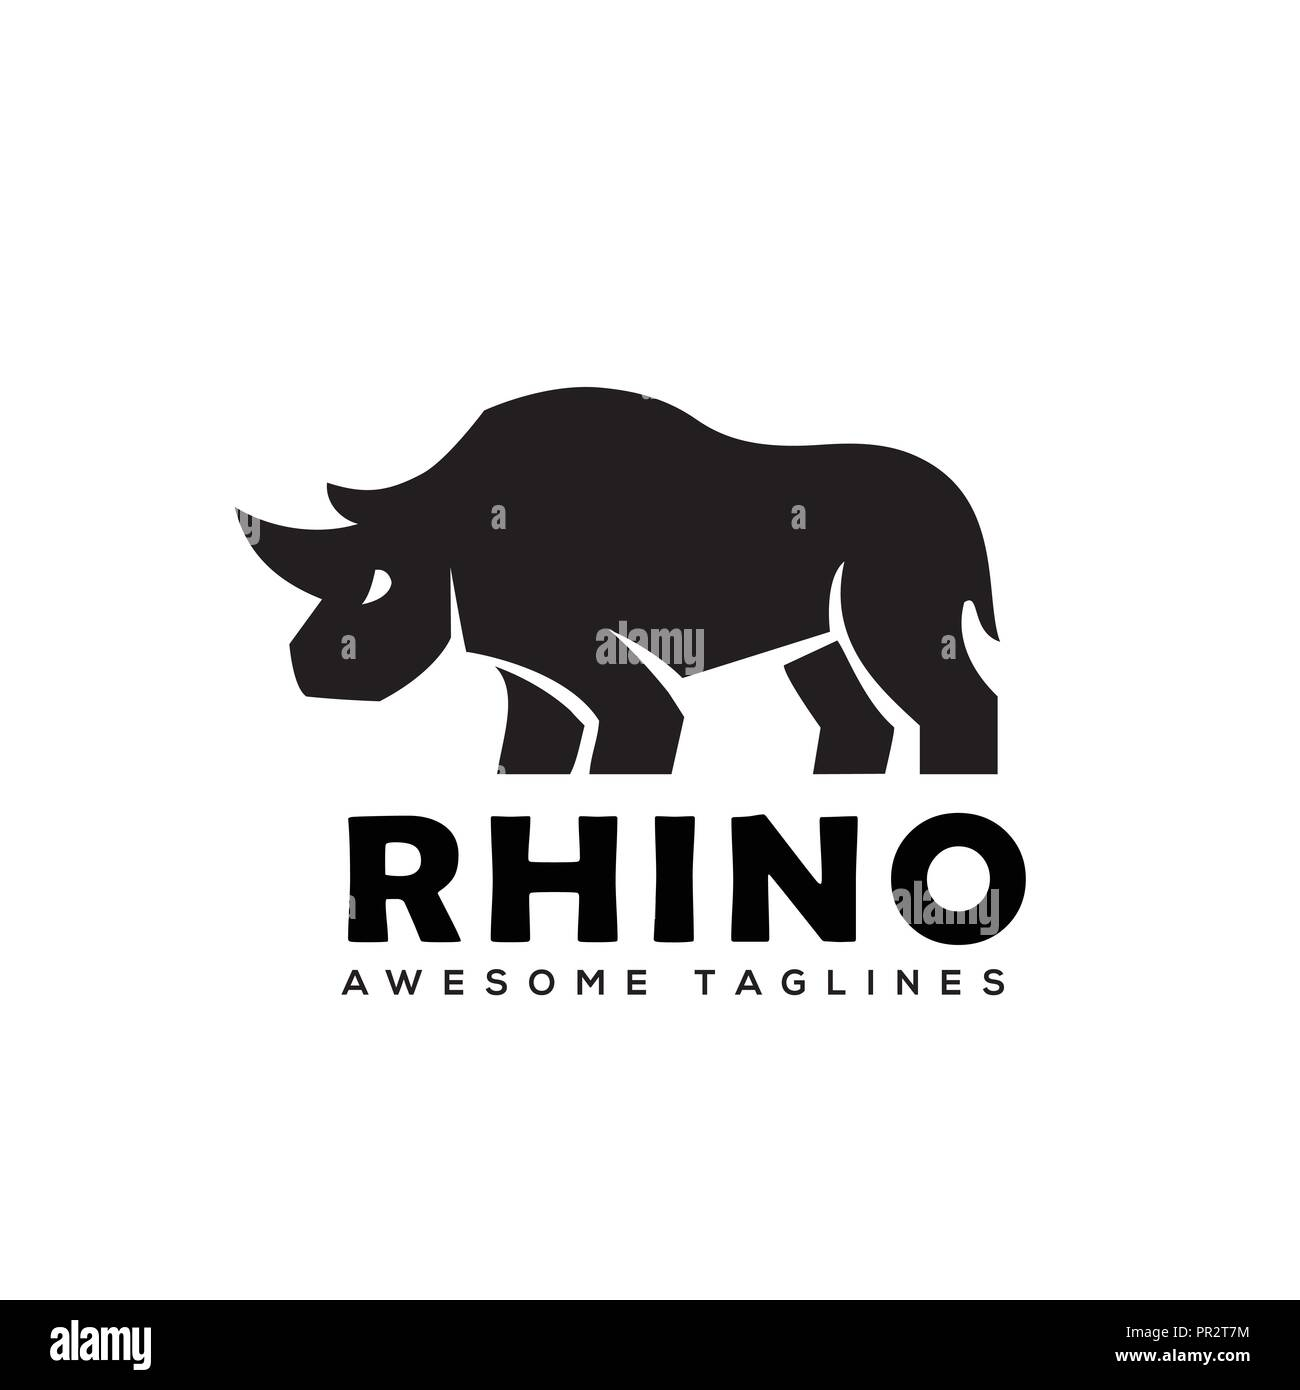 rhino logo vector rhinoceros logo monochrome color business